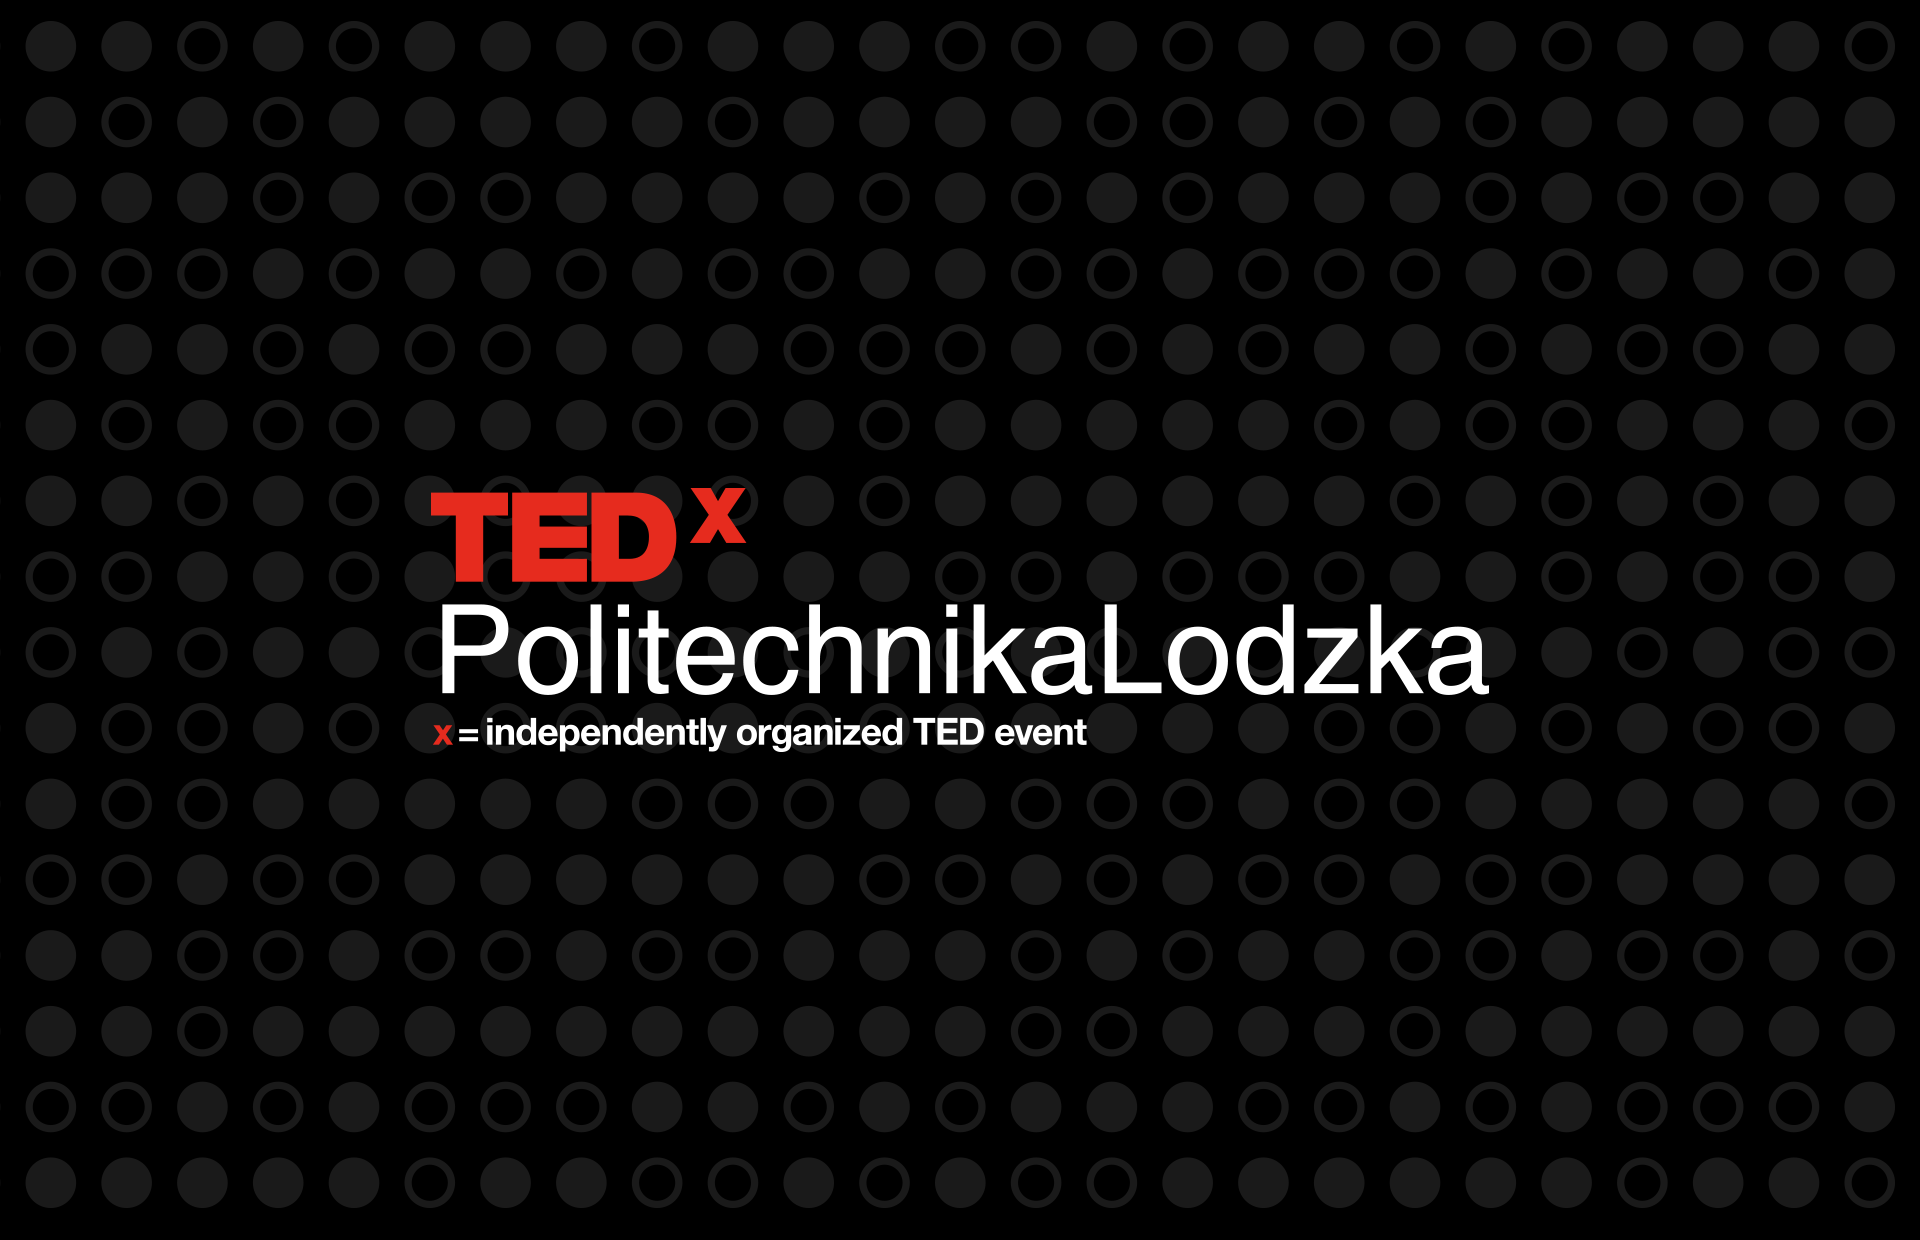 TEDxPolitechnikaLodzka